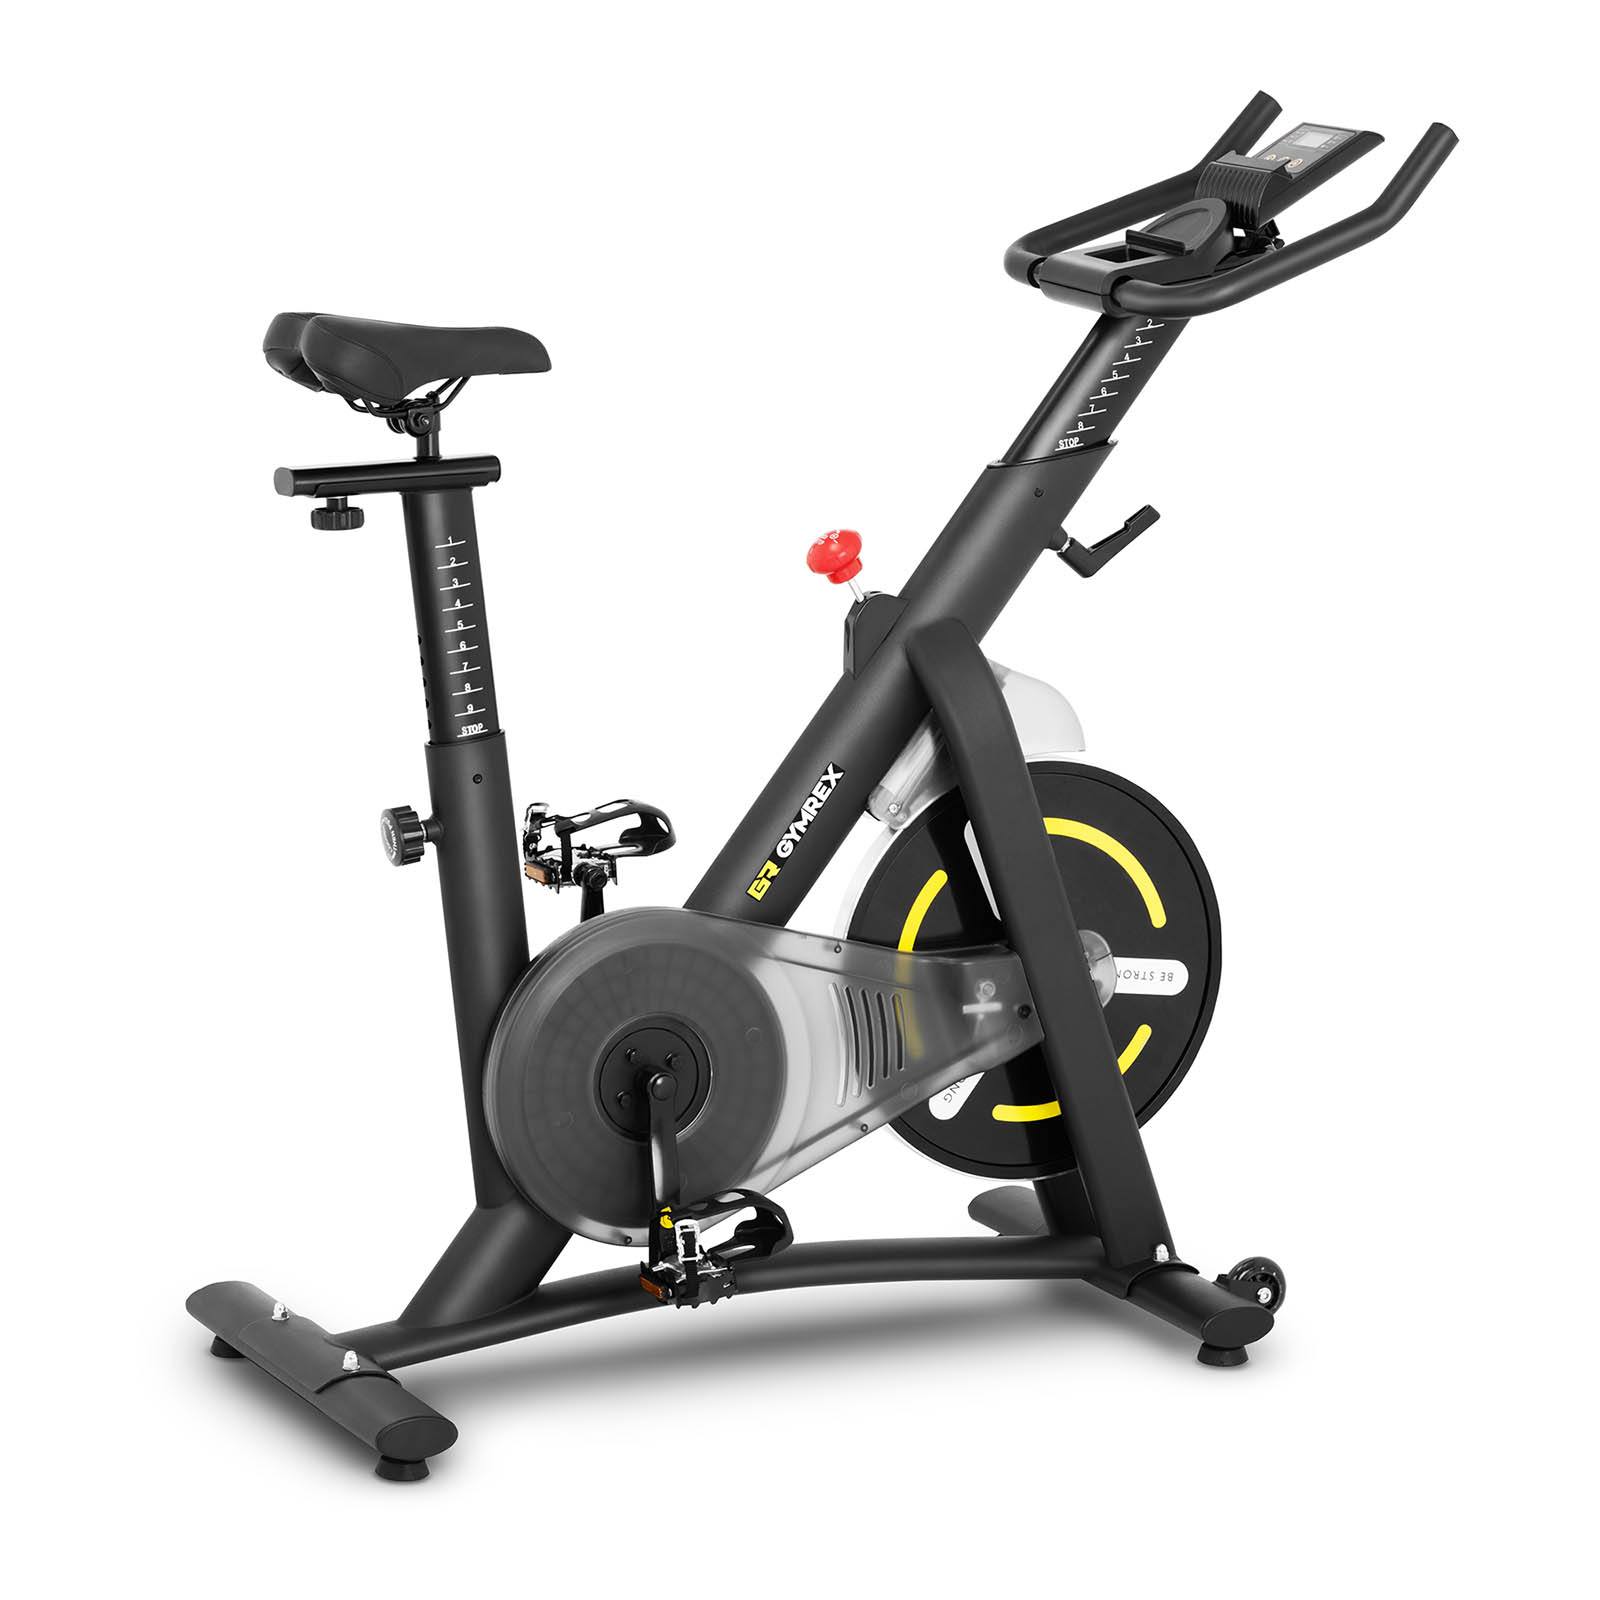 Stacionárny bicykel - LCD panel Gymrex   GR-MG13